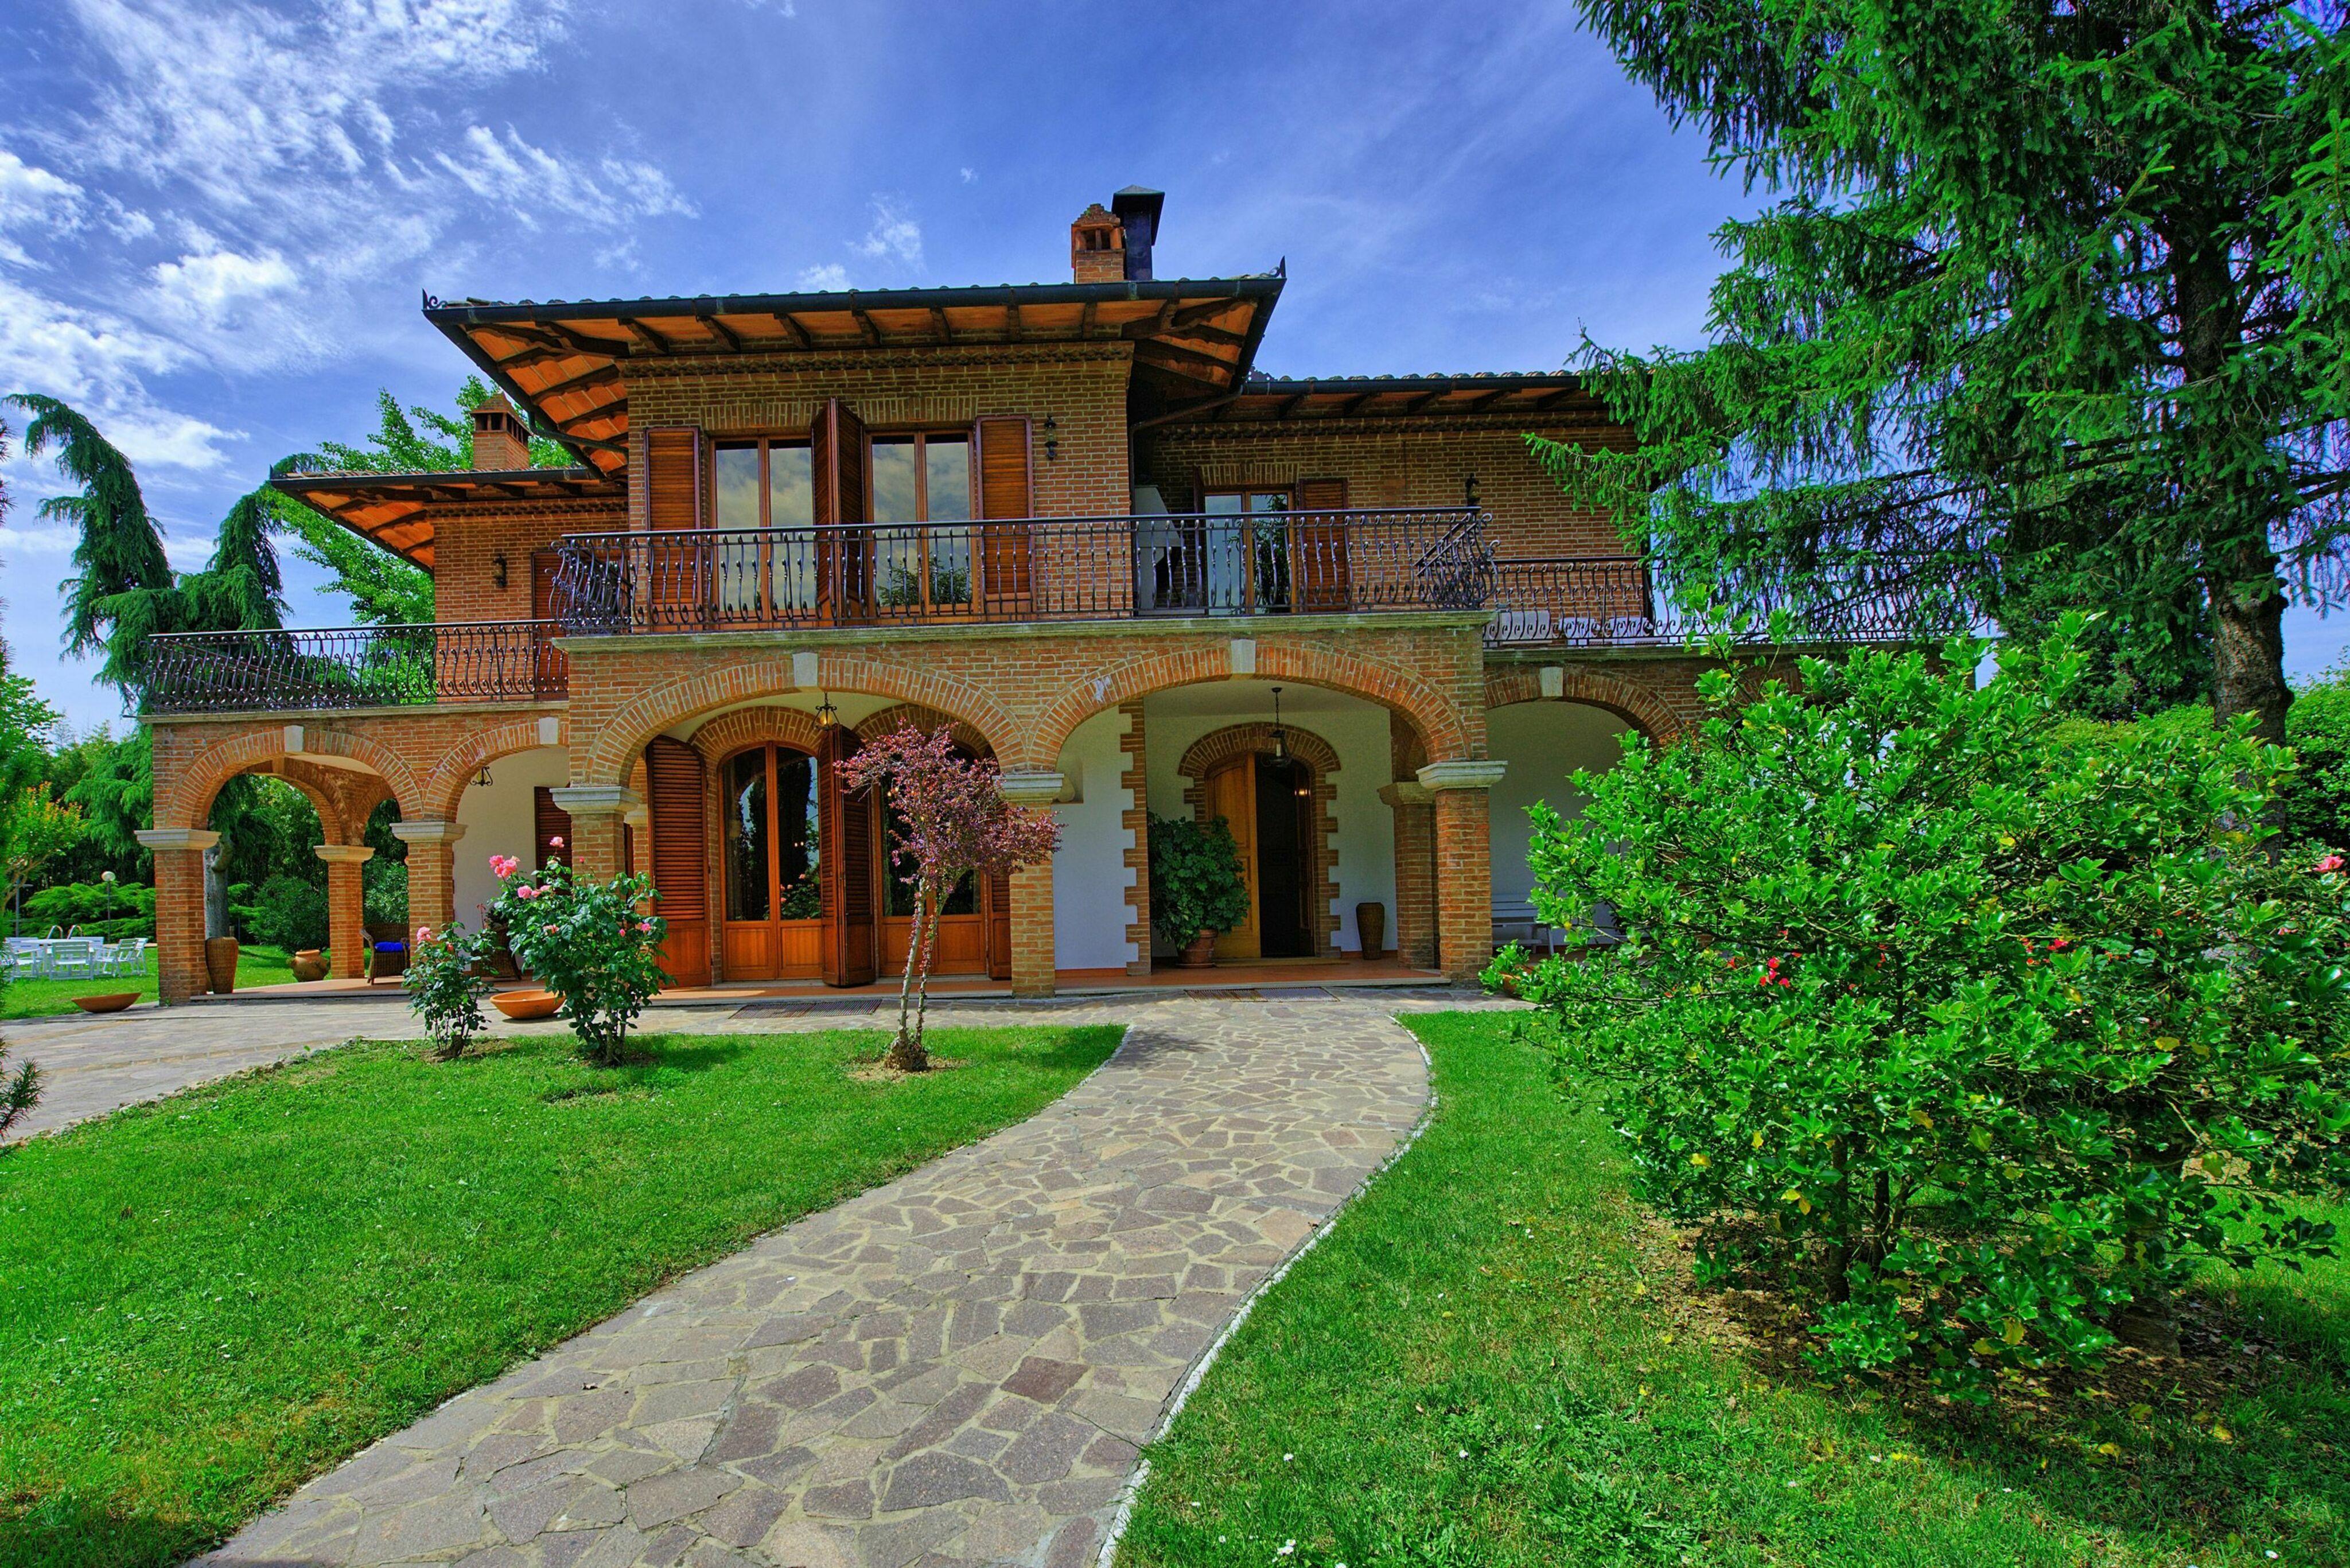 Villa Lauretana Torrita Di Siena